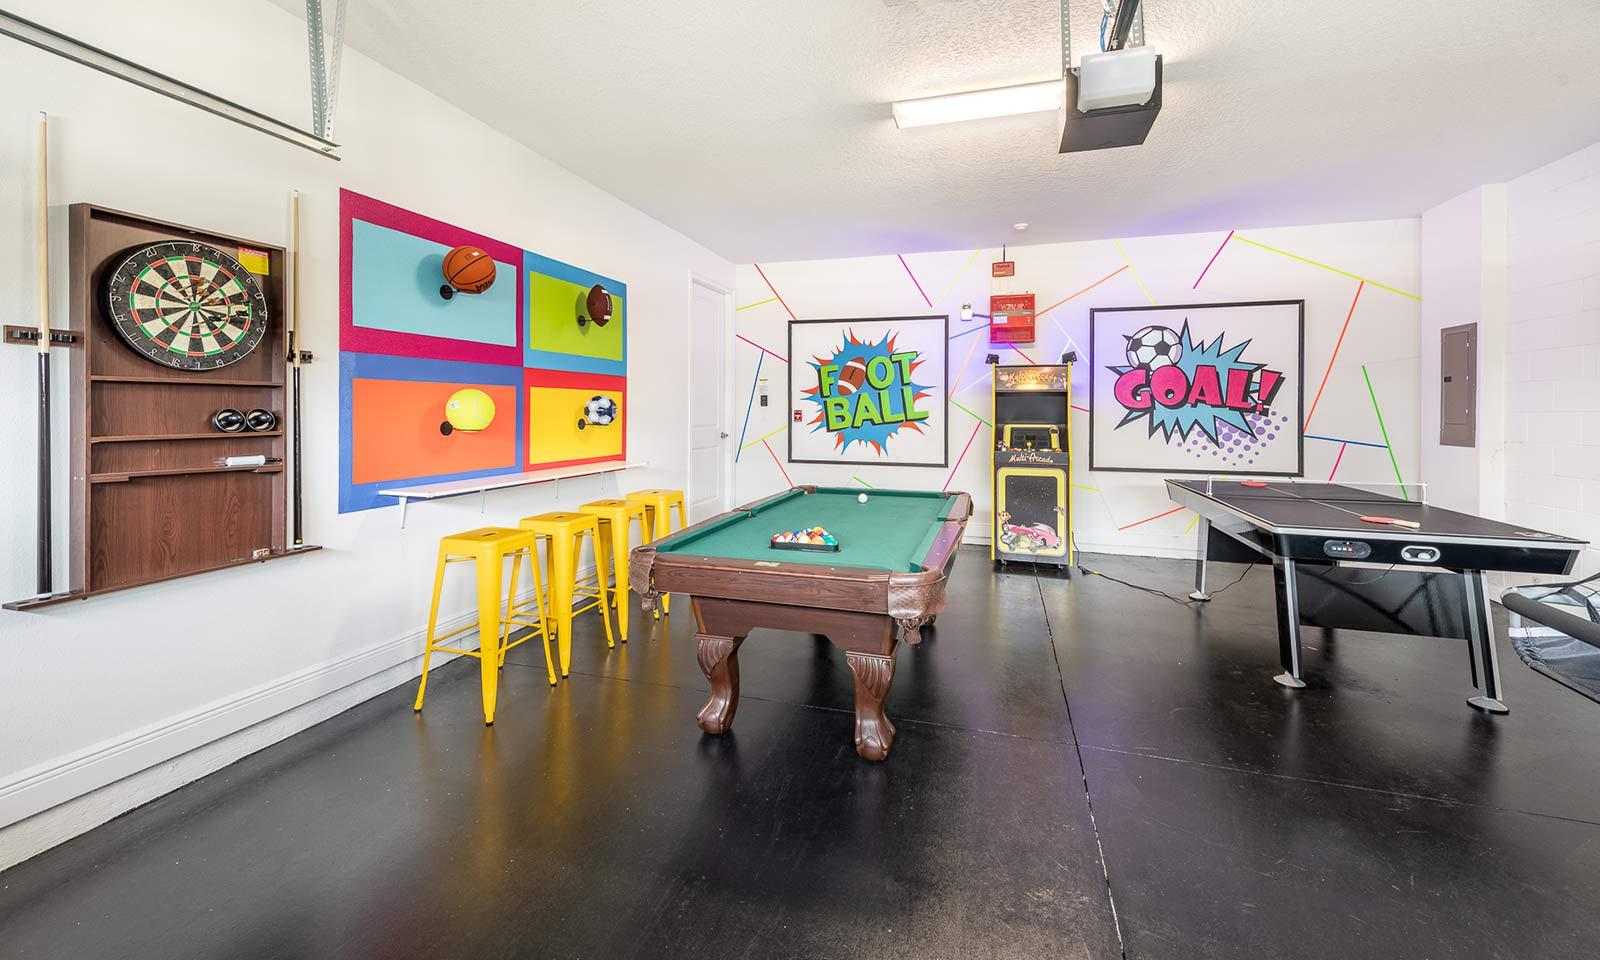 [amenities:game-room:2] Game Room